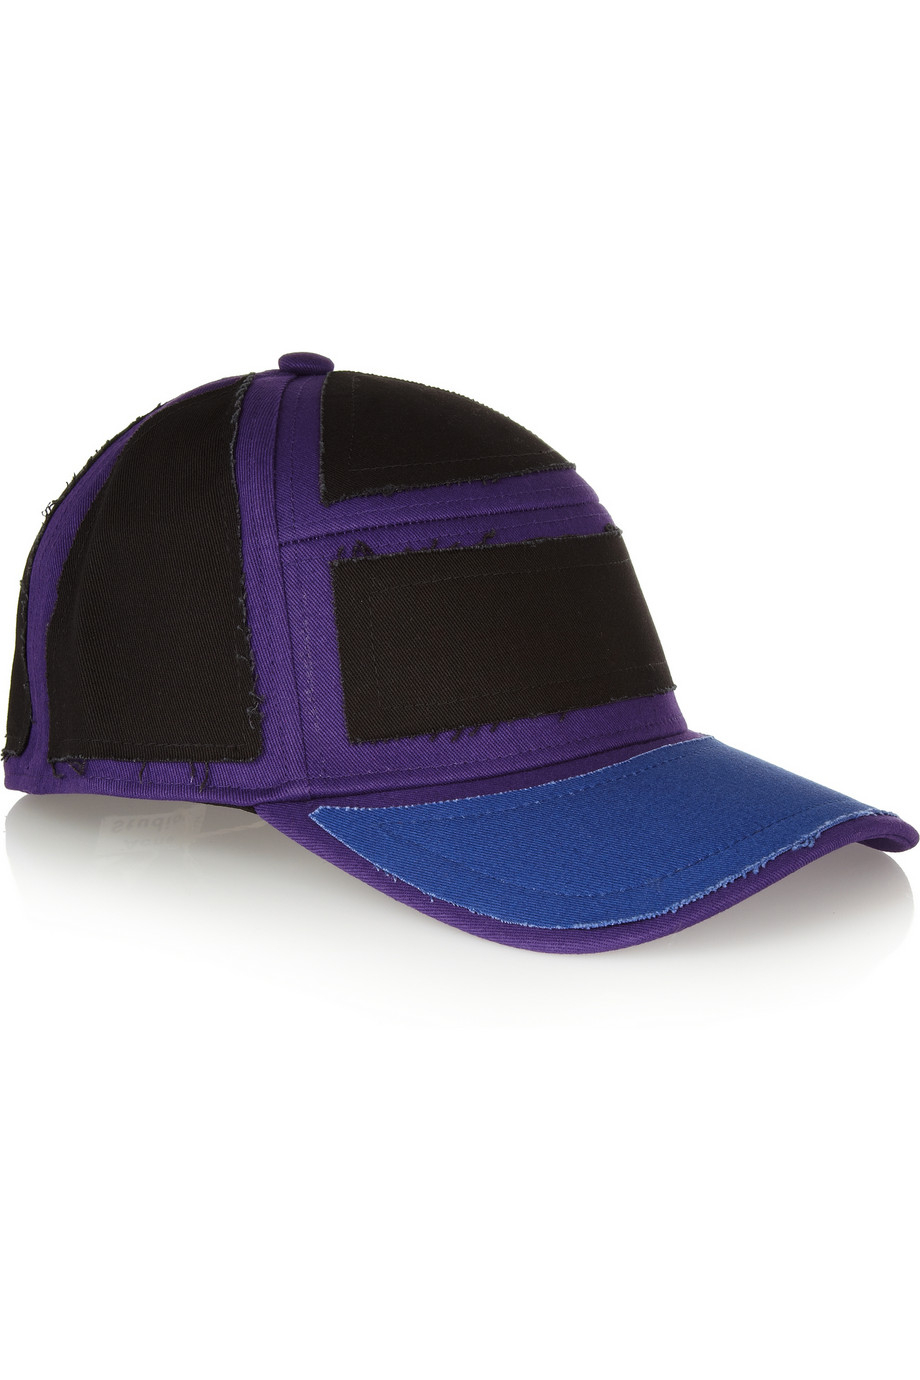 6b6f1811cbb Lyst - Acne Studios Clint Patch Stretch-cotton Twill Baseball Cap in ...